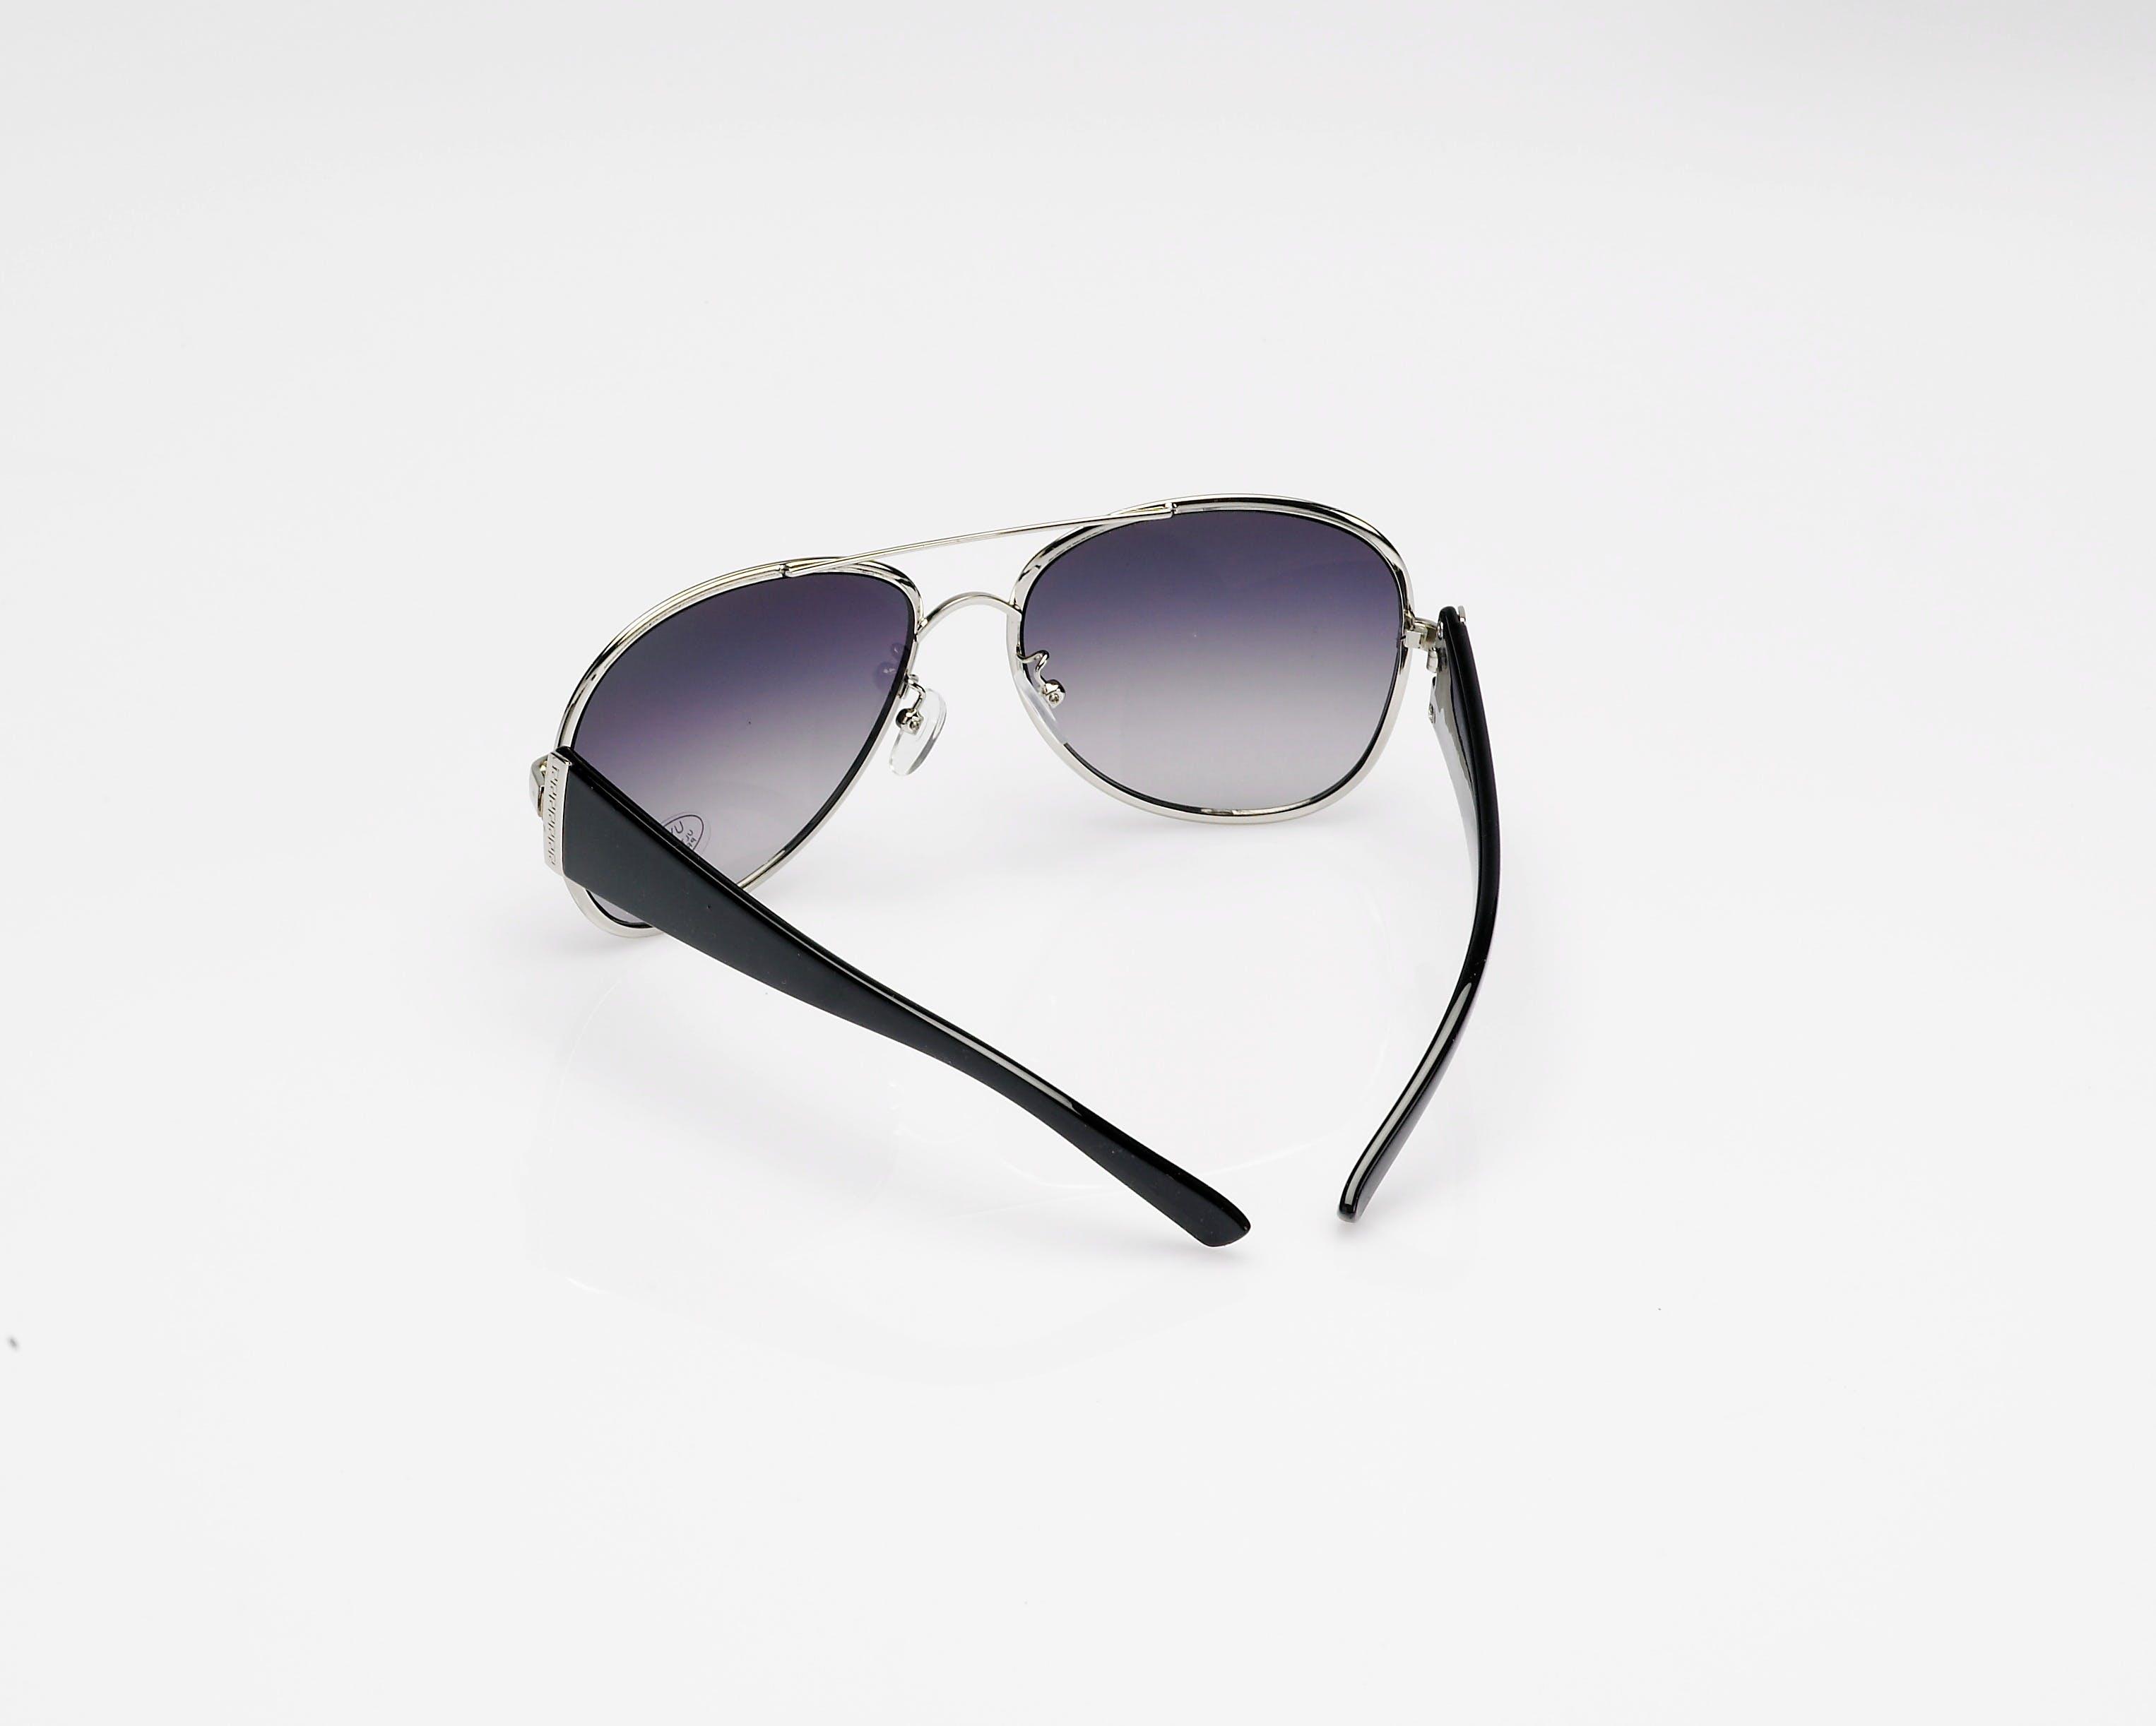 Black Grey Framed Aviator Style Sunglasses